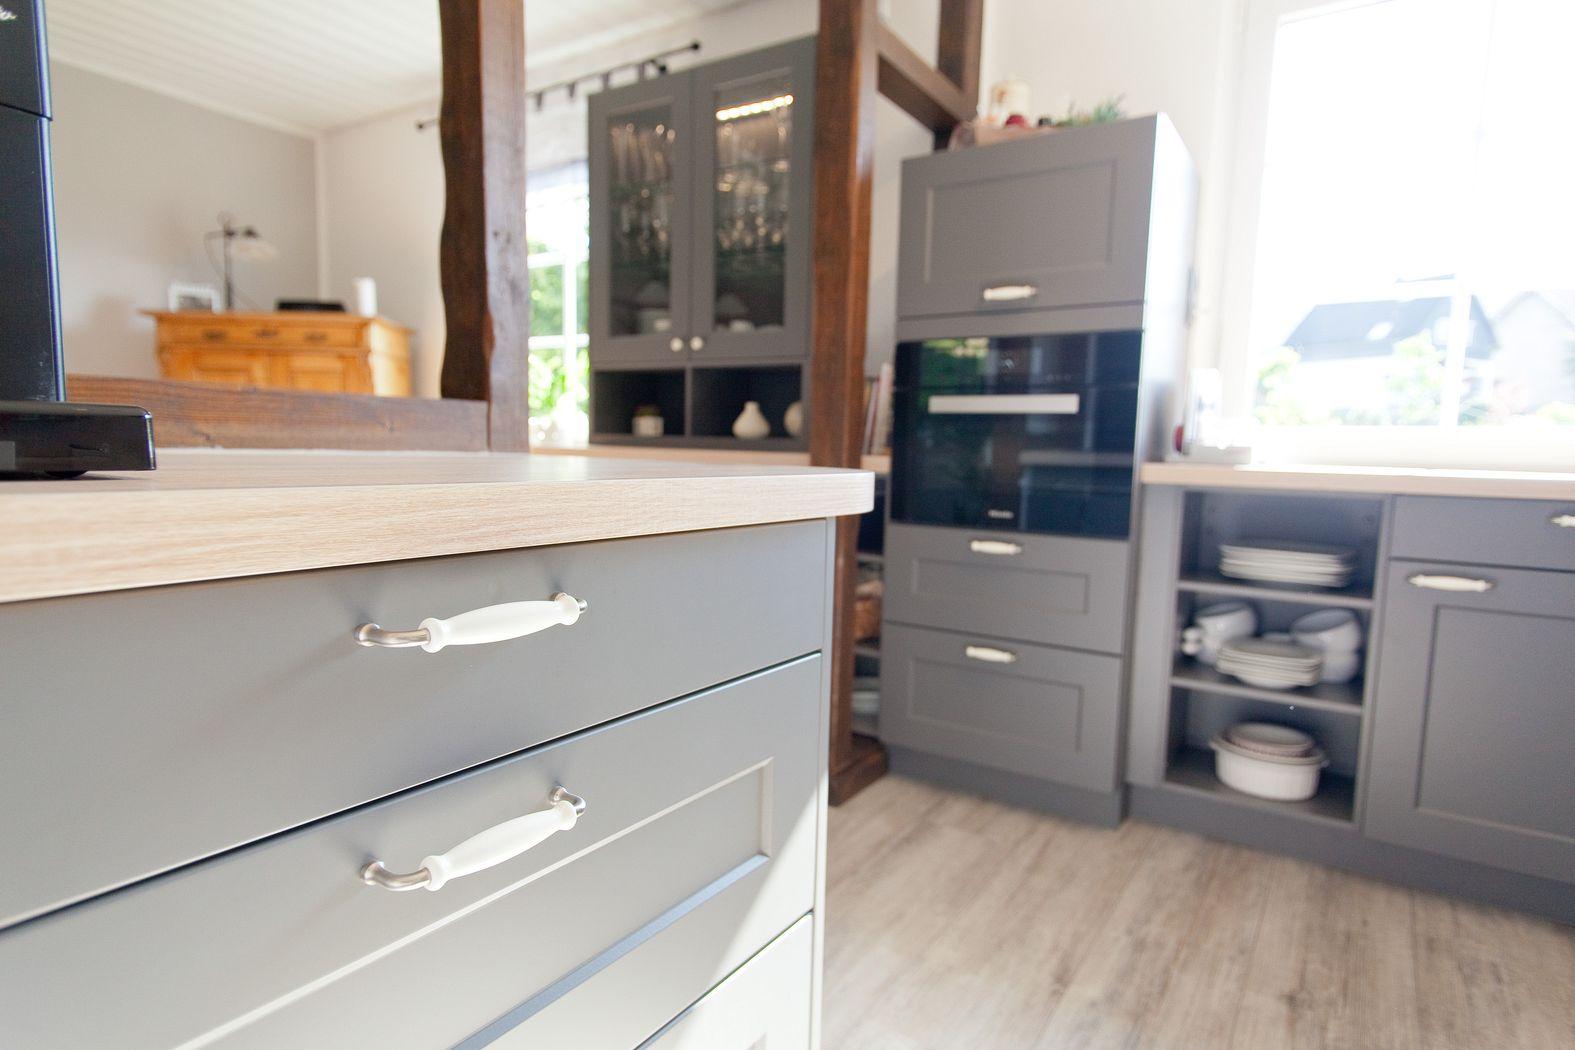 k che holz modern hausgestaltung ideen. Black Bedroom Furniture Sets. Home Design Ideas